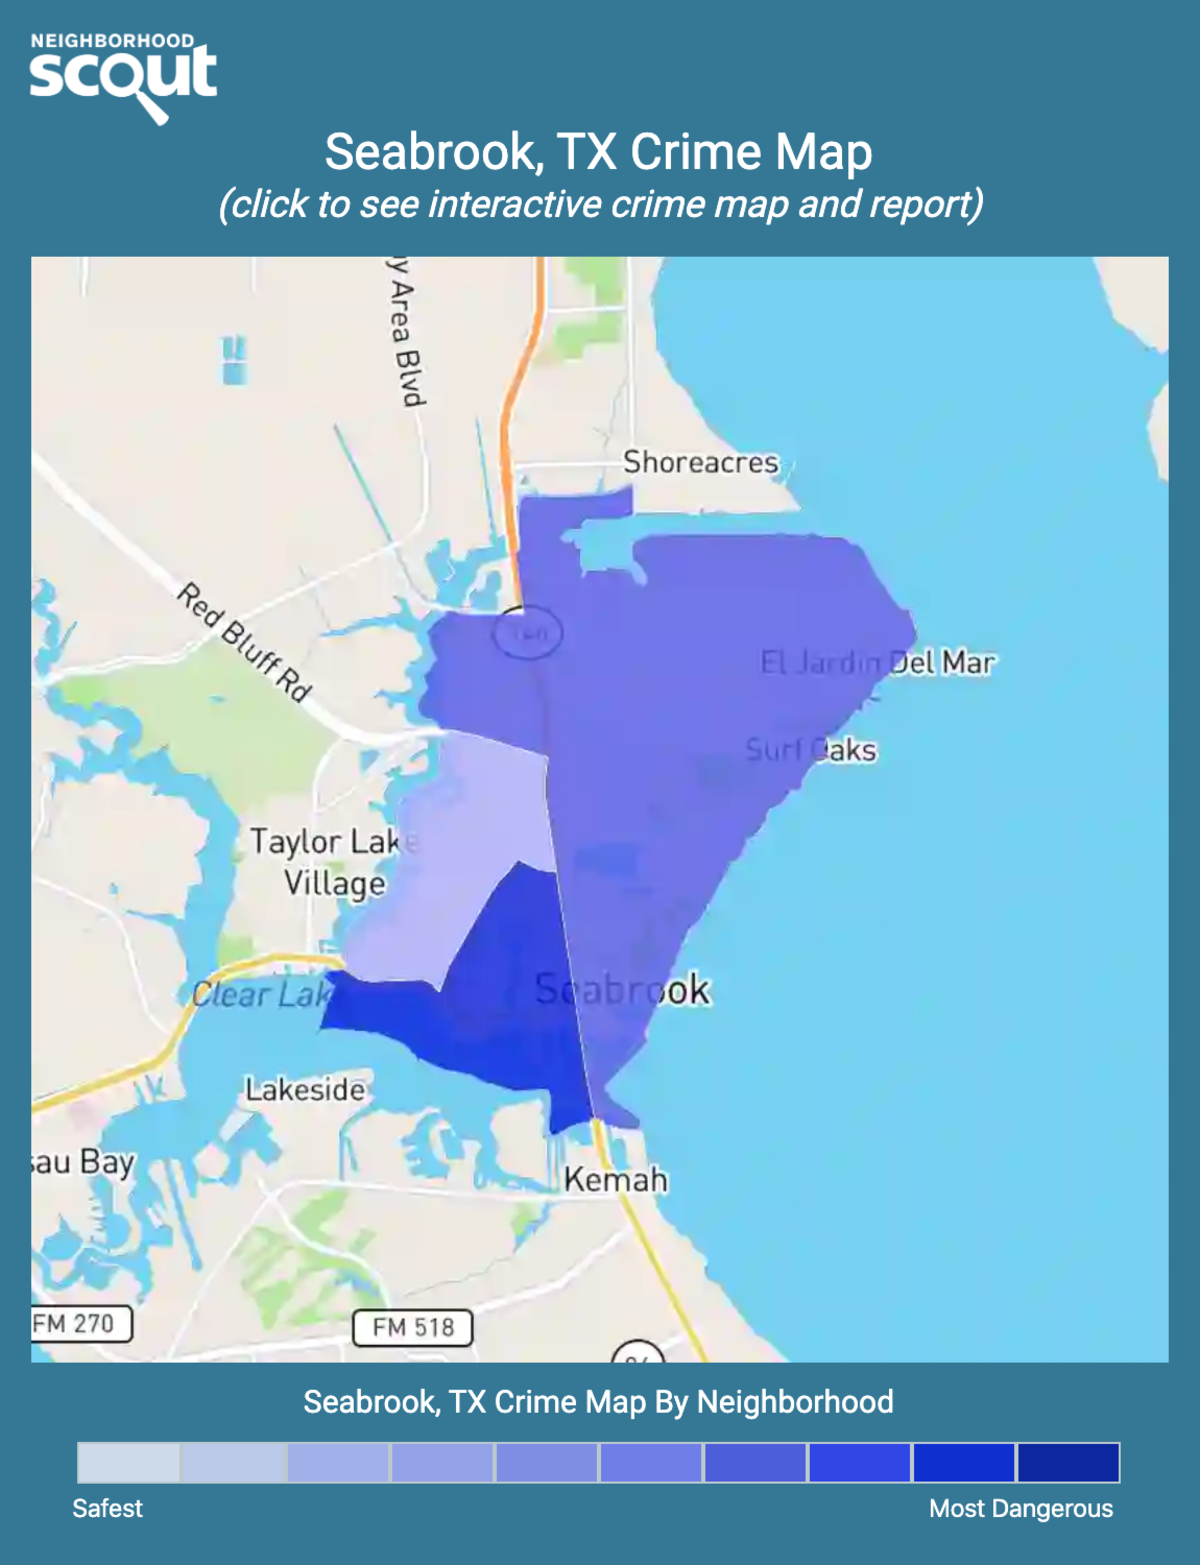 Seabrook, Texas crime map